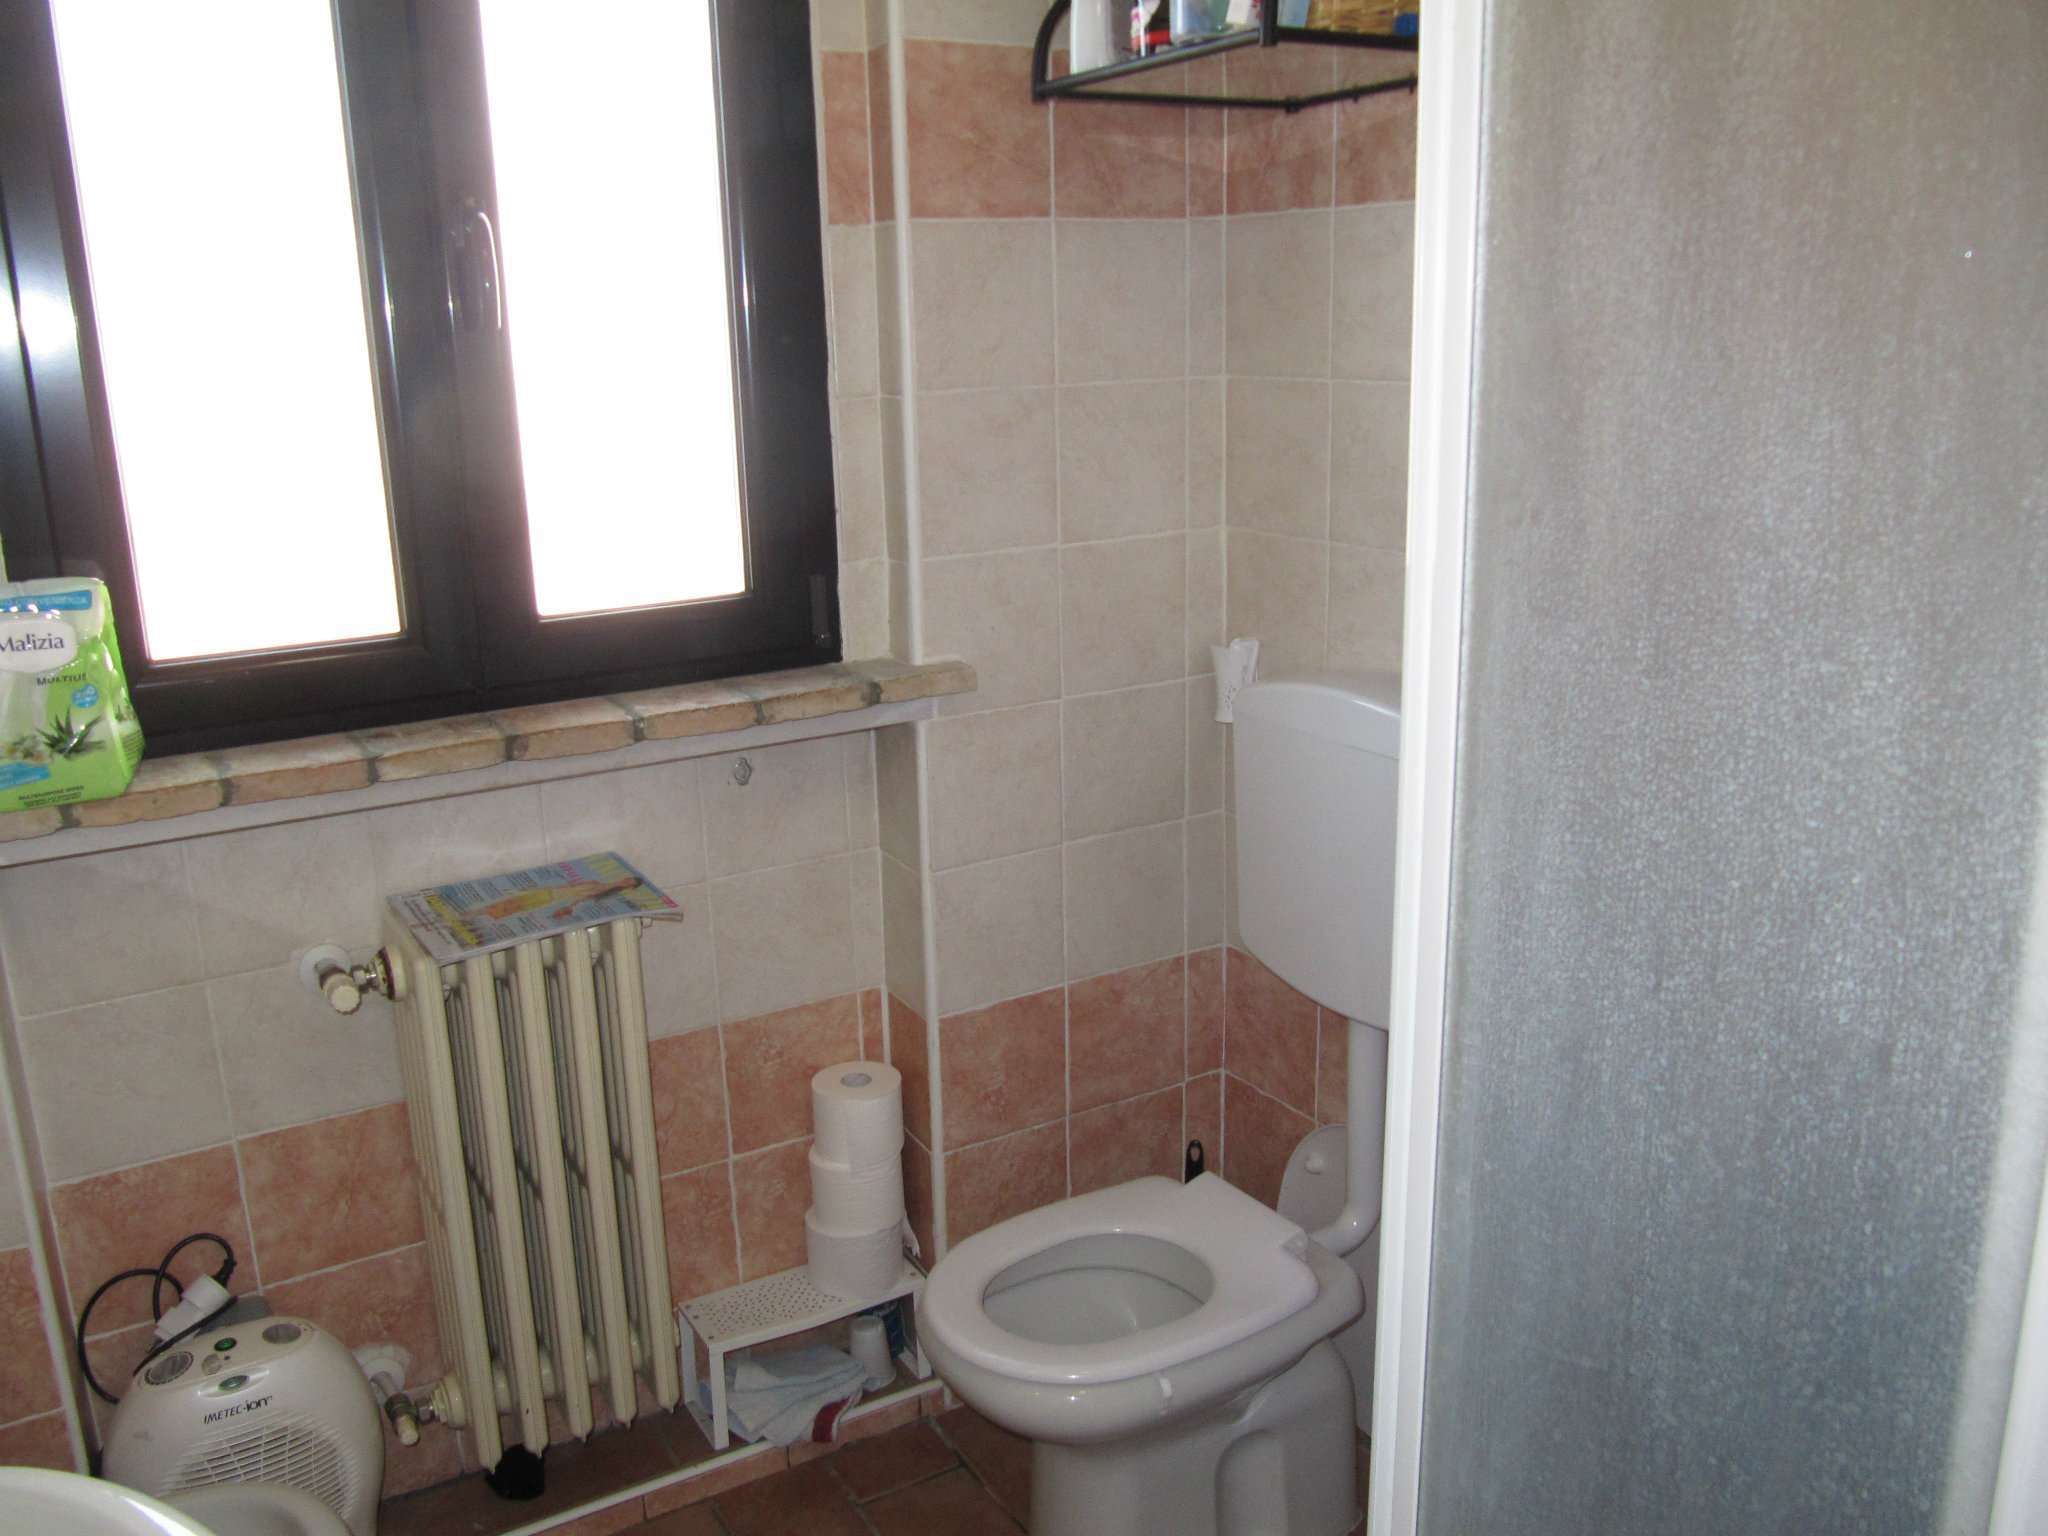 Bilocale Parma Via Case Vecchie 8